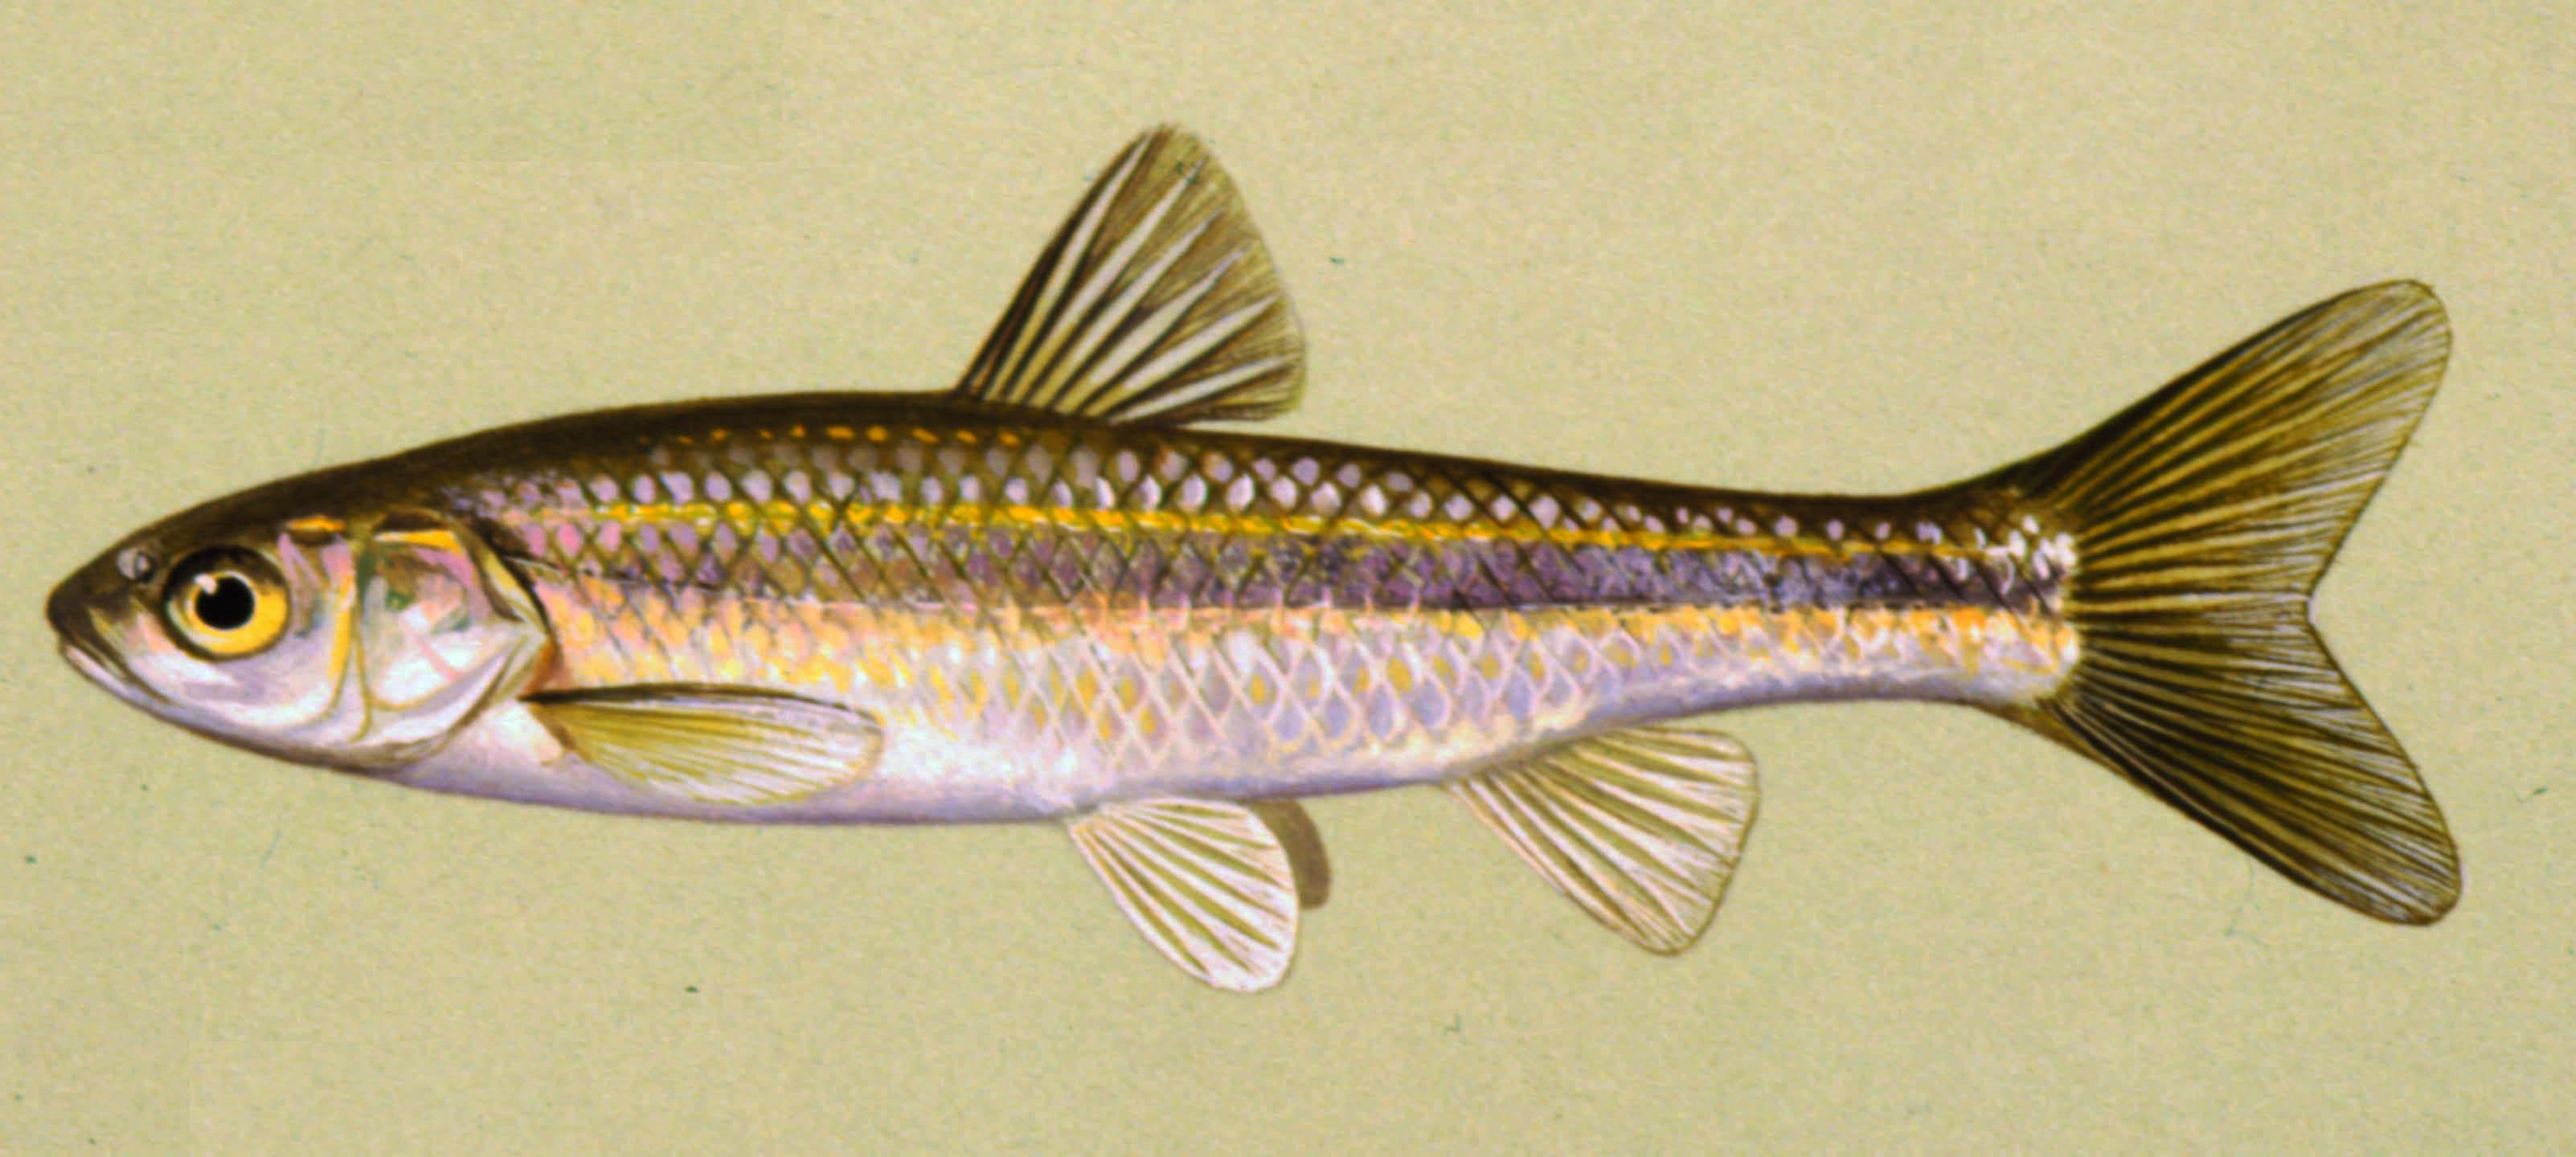 Details brassy minnow for Iowa fishing regulations